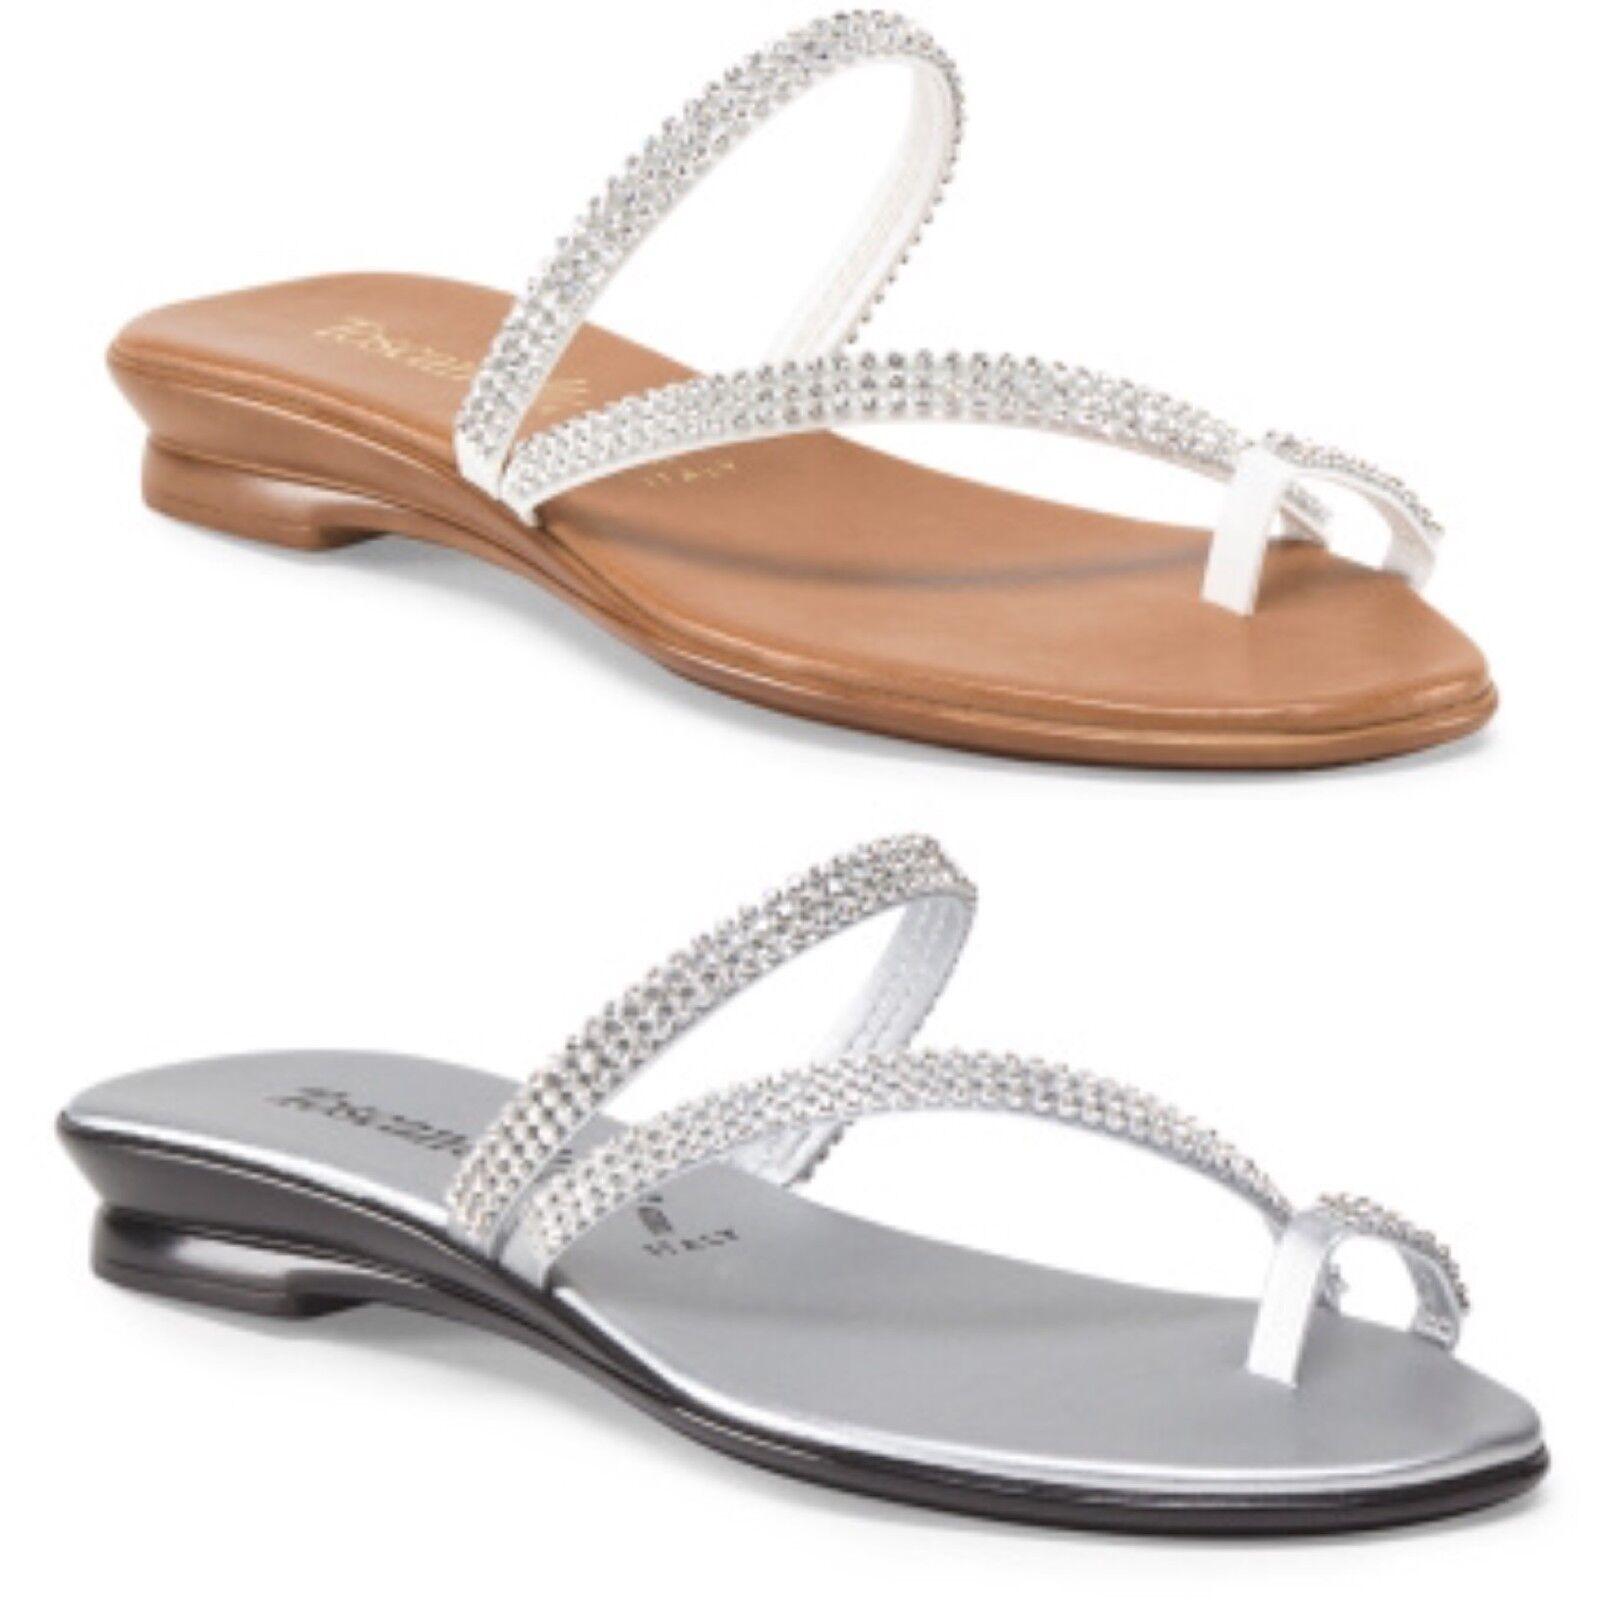 ITALIAN SHOEMAKERS TOSCANELLA Made In  Amaris Toe Ring Sandals RHINESTONE